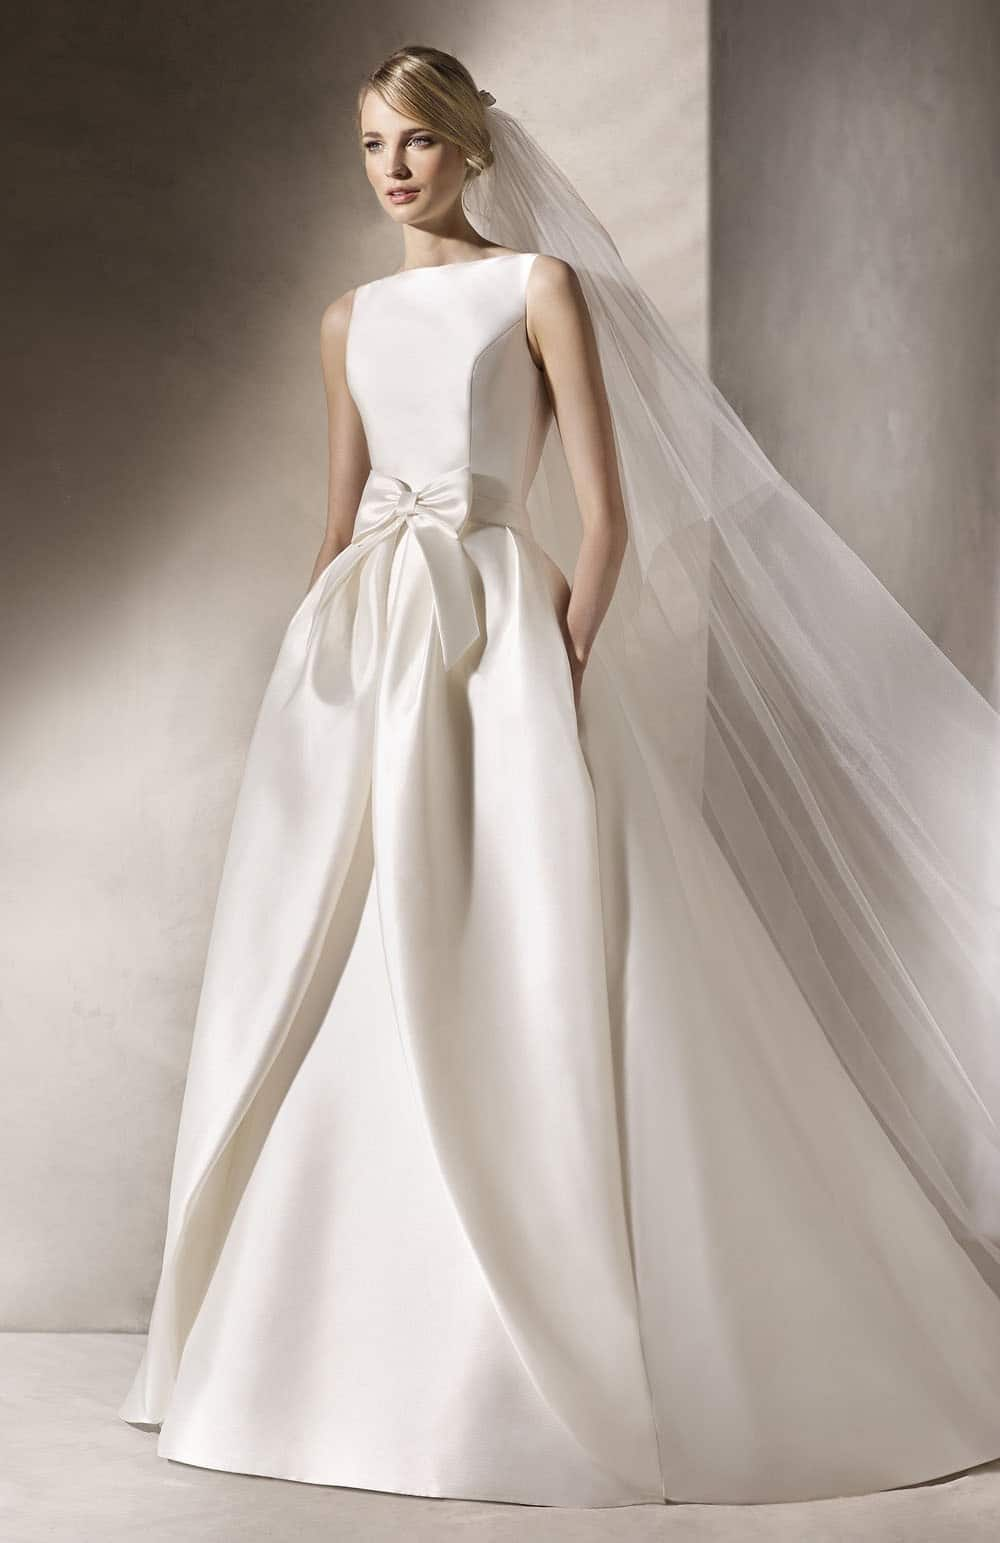 Robe de mariée Modèle Halazgo